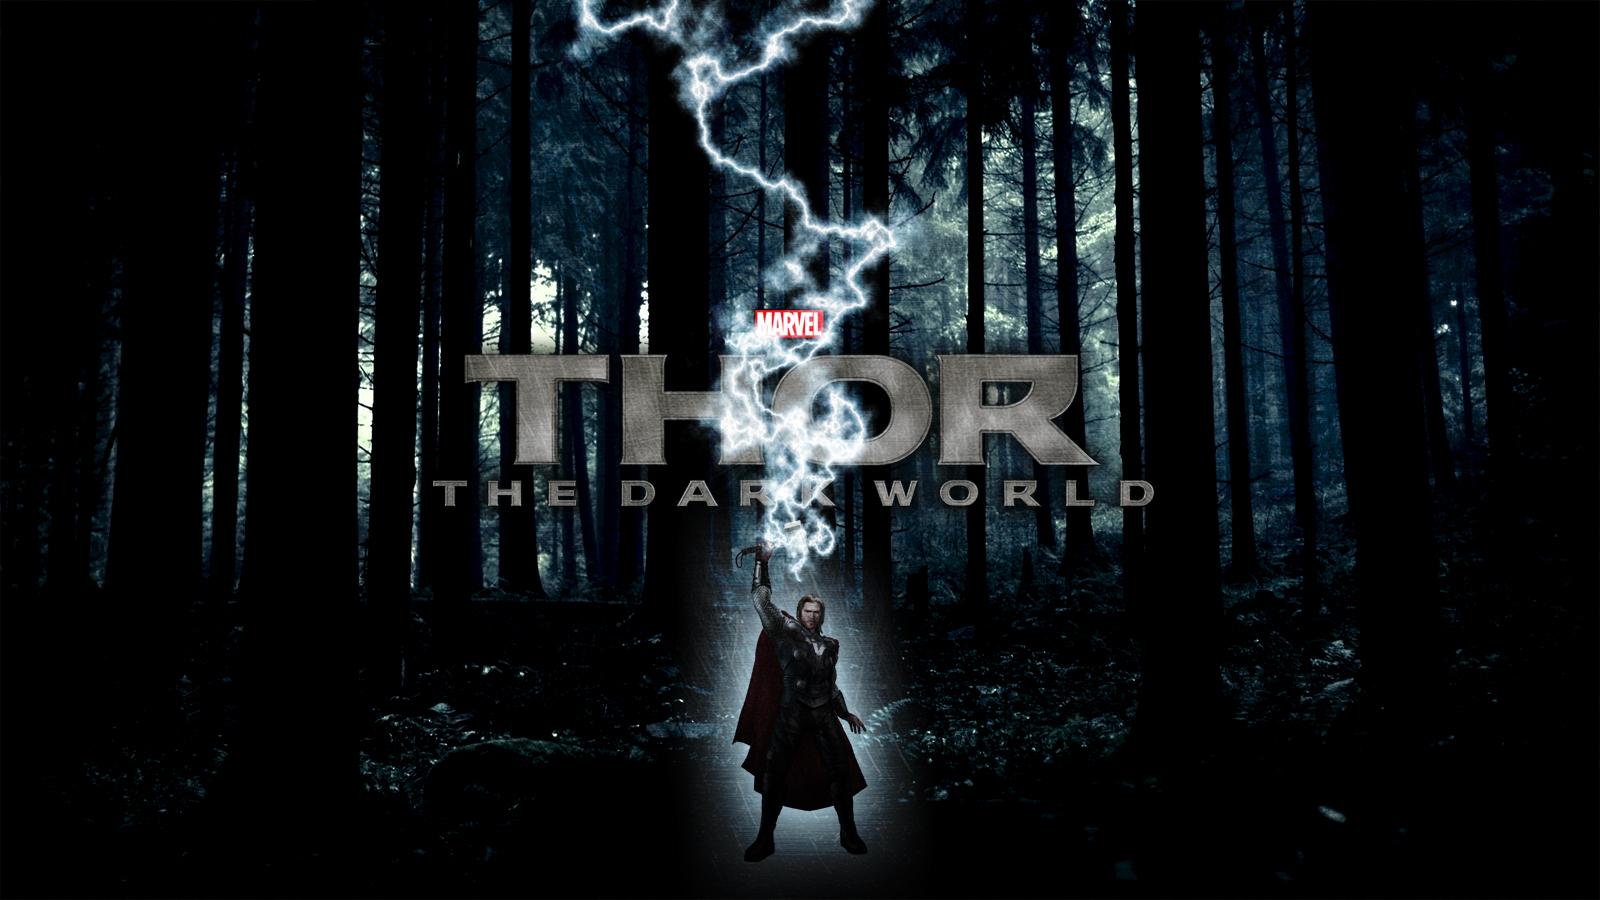 thor the dark world wallpaper - photo #11